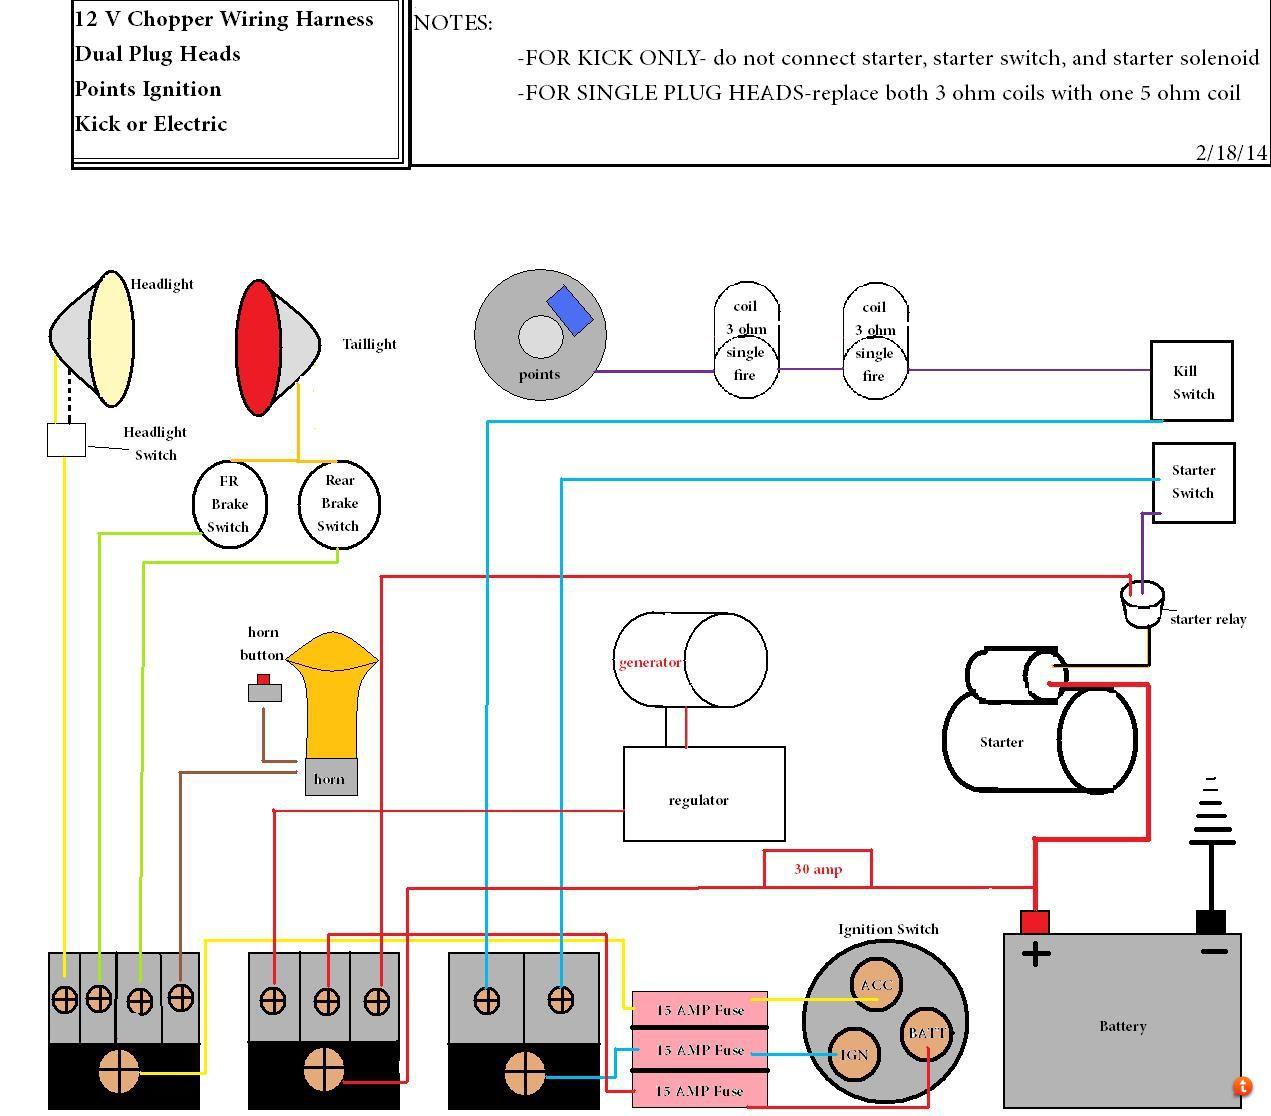 Basic Chopper Wiring,Chopper.Wiring Diagram Images Database on xt350 wiring diagram, xj550 wiring diagram, xj750 wiring diagram, chopper wiring diagram, yz426f wiring diagram, xs360 wiring diagram, xvz1300 wiring diagram, xvs650 wiring diagram, virago wiring diagram, xs400 wiring diagram, xv920 wiring diagram, xs850 wiring diagram, cb750 wiring diagram, xv535 wiring diagram, xs1100 wiring diagram, xj650 wiring diagram, fj1100 wiring diagram, it 250 wiring diagram, fz700 wiring diagram, yamaha wiring diagram,